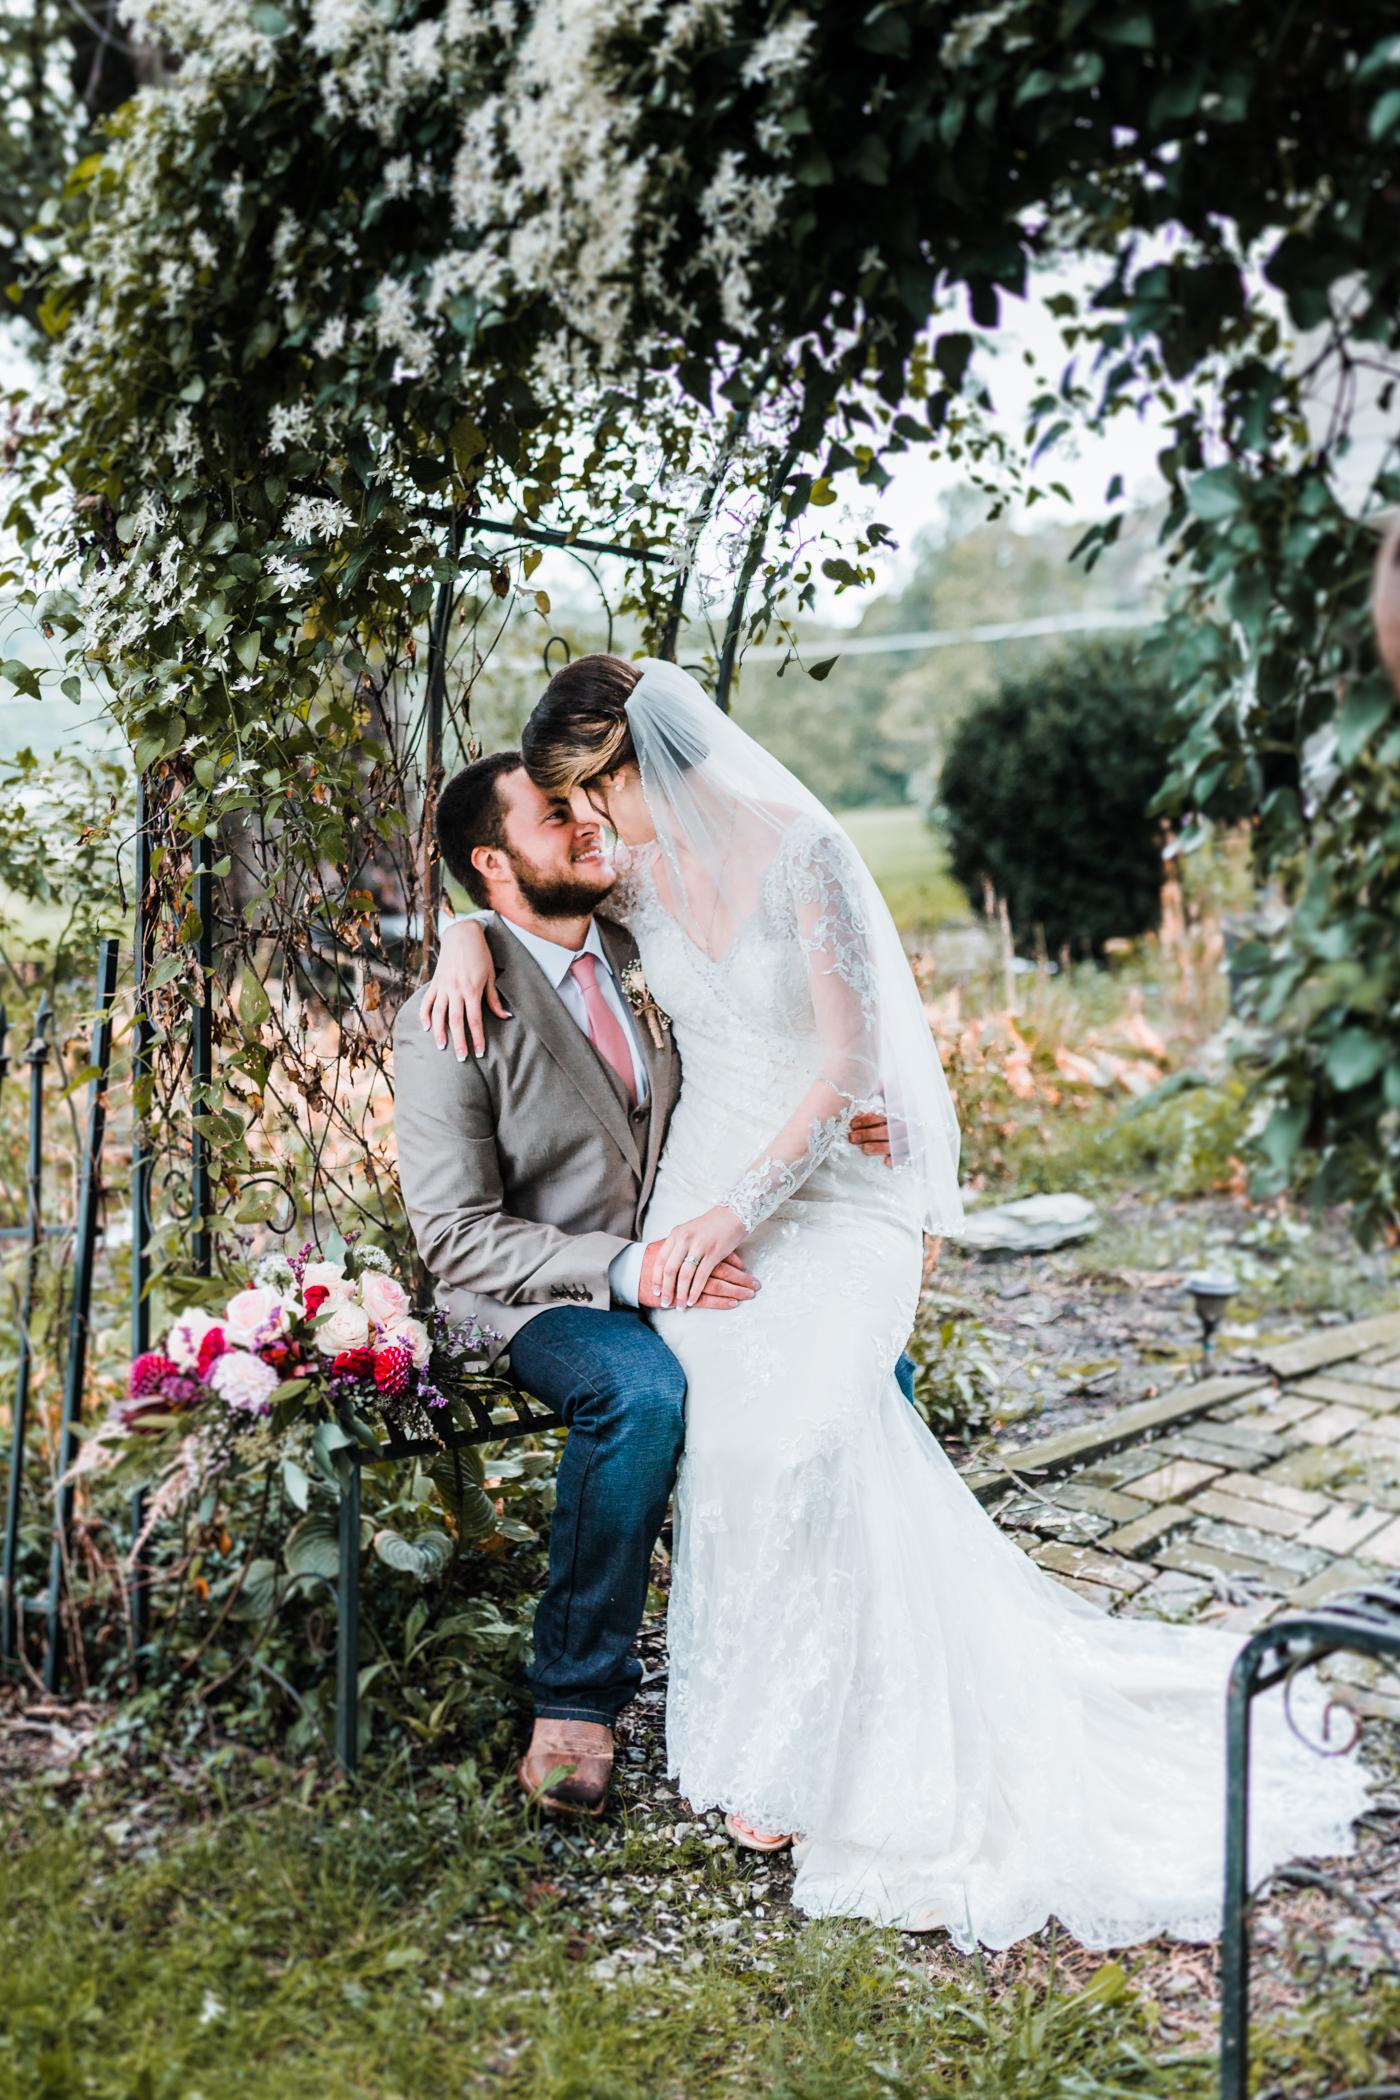 bride and groom in garden setting